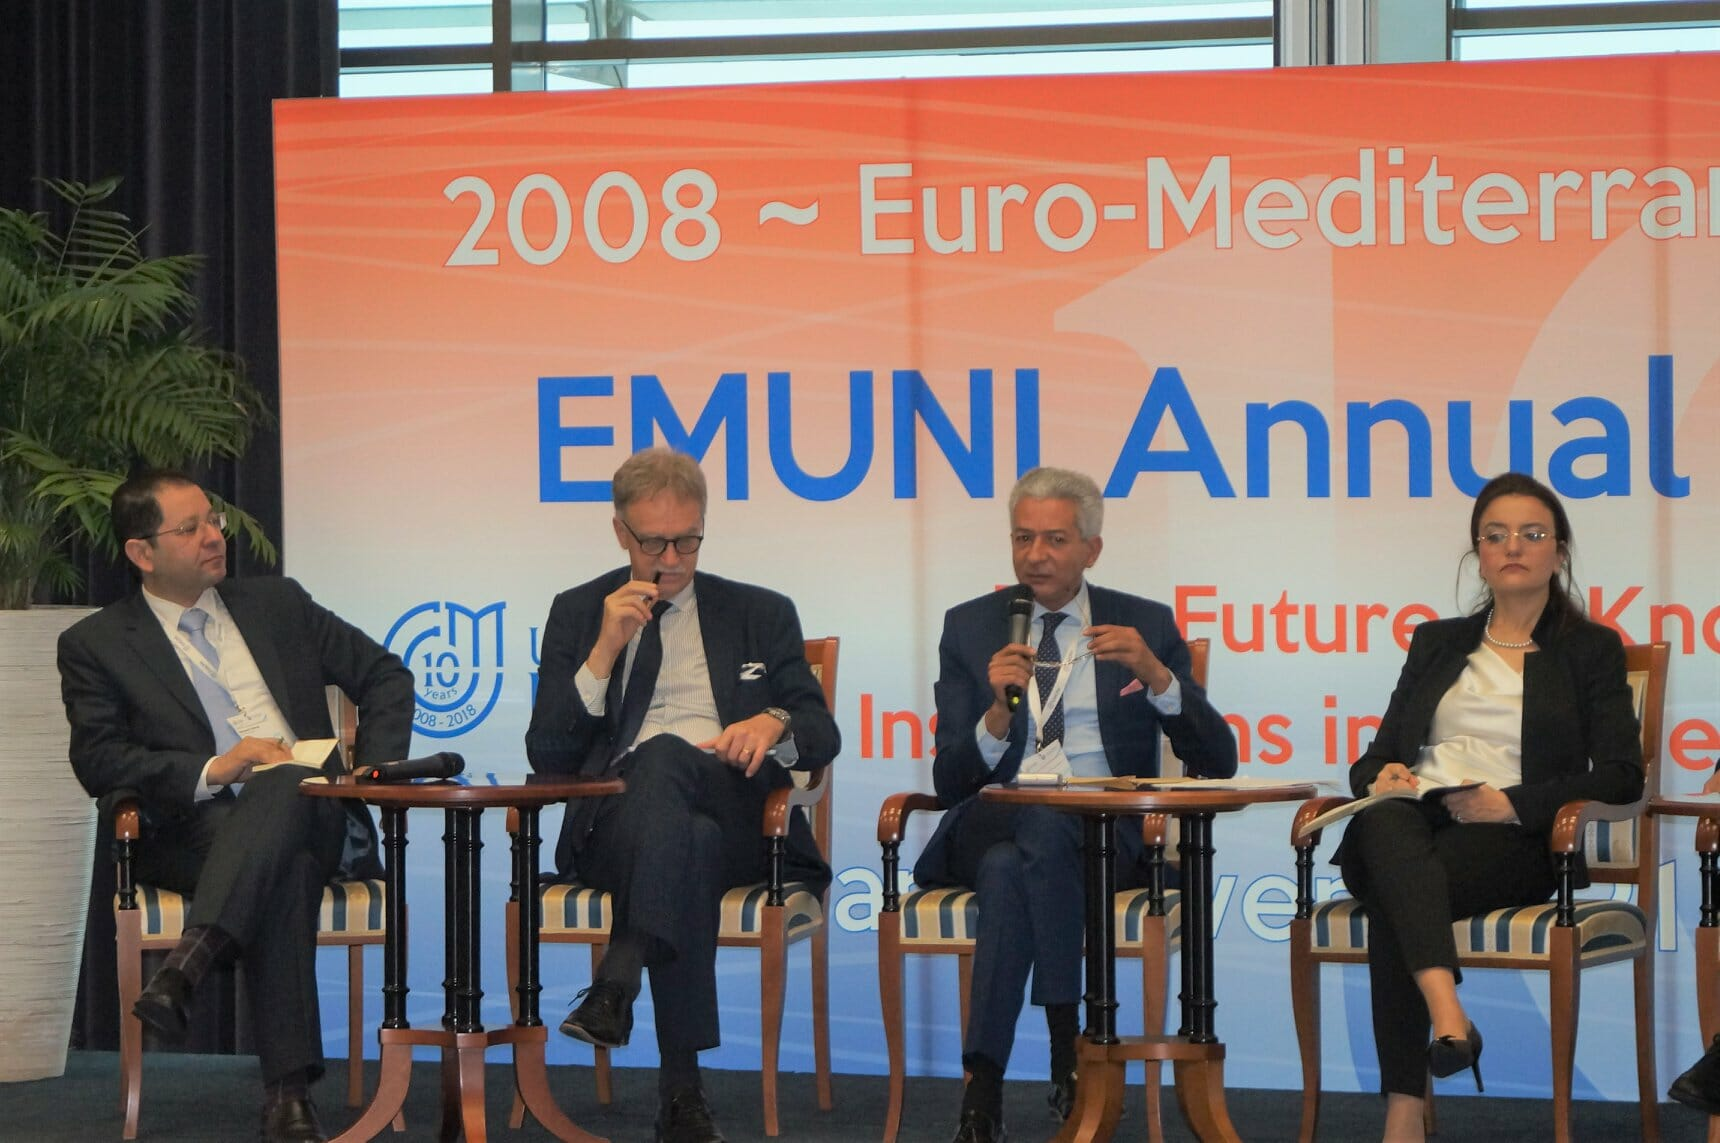 EMUNI Conference